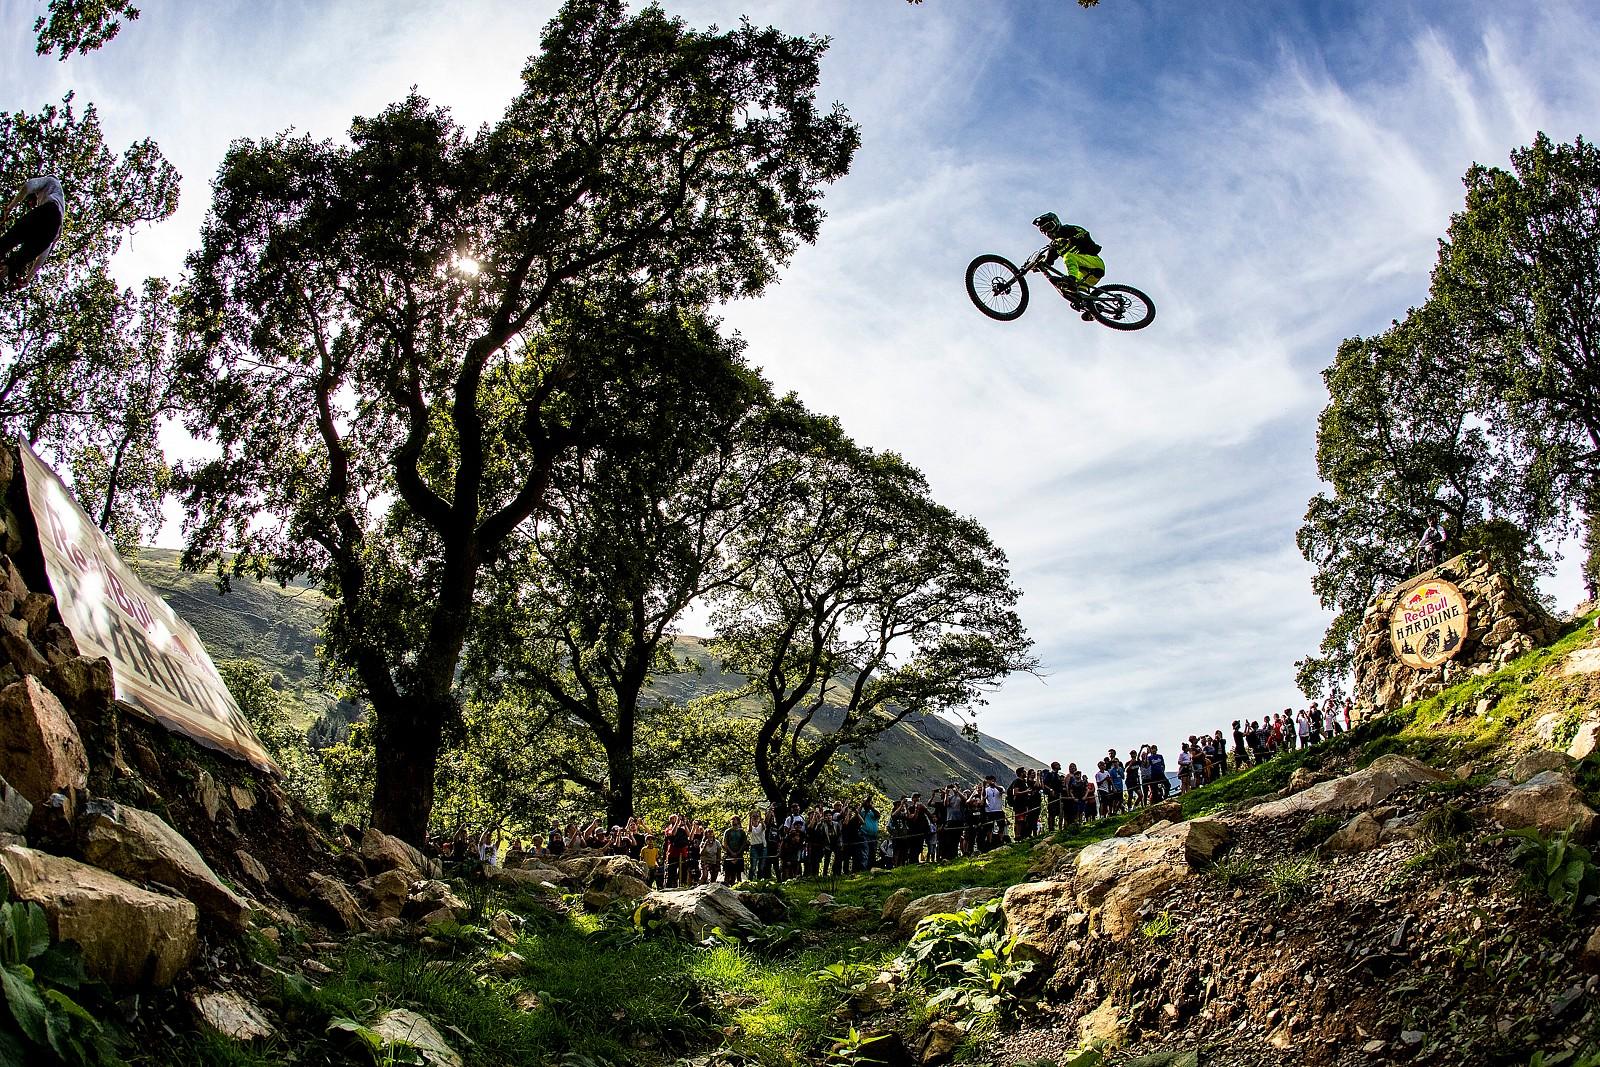 Brendan Fairclough - Red Bull Hardline in Photos - Mountain Biking Pictures - Vital MTB